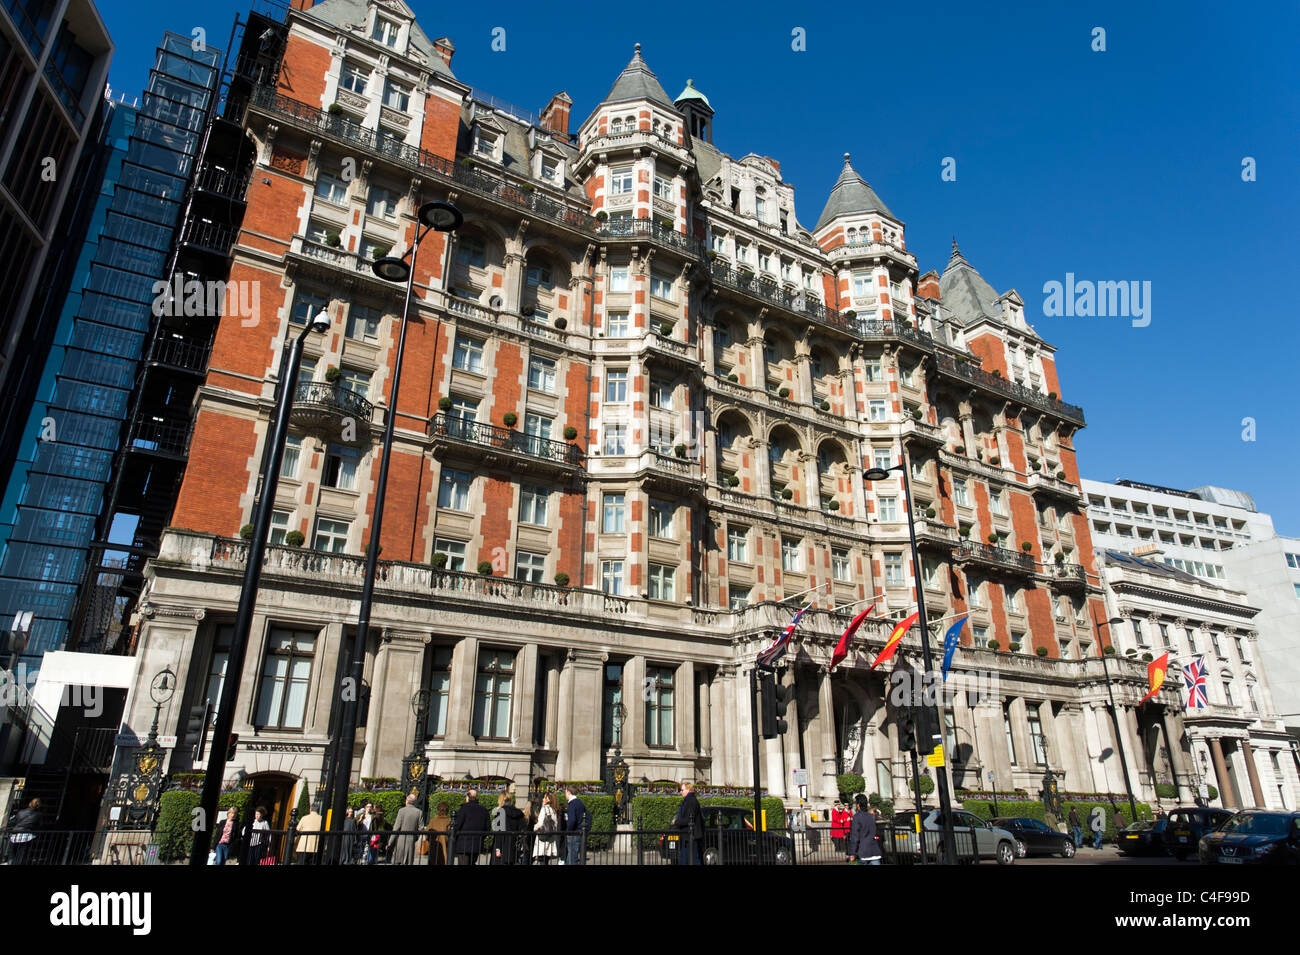 The Mandarin Oriental Hotel, Knightsbridge, London, UK - Stock Image